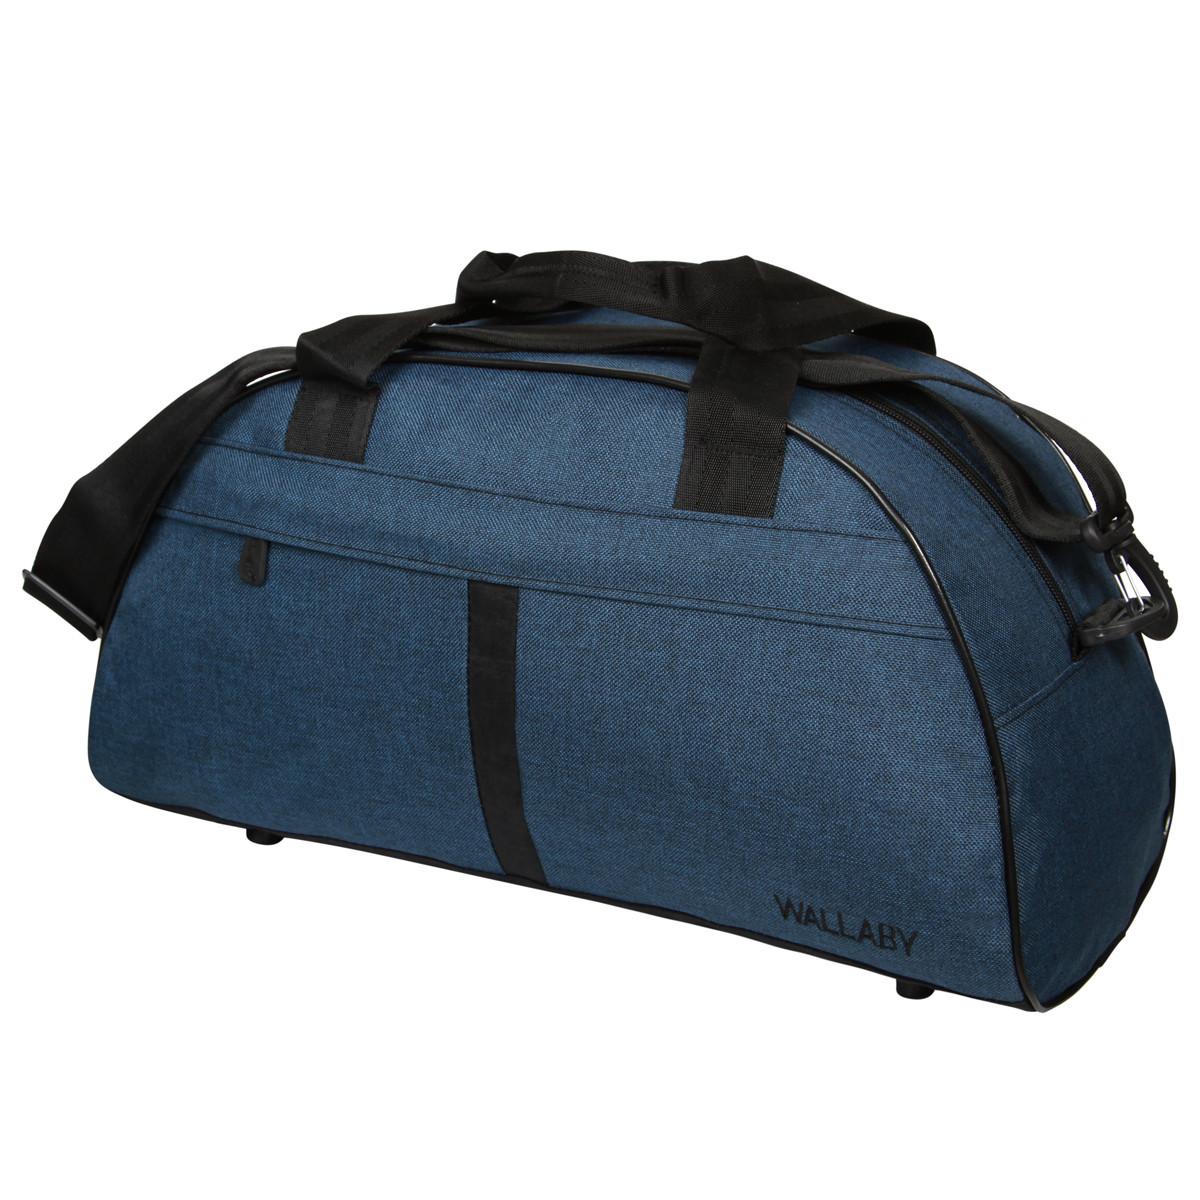 Дорожно-спортивная сумка Wallaby малая 44х28х20 полиэстер  в 213син